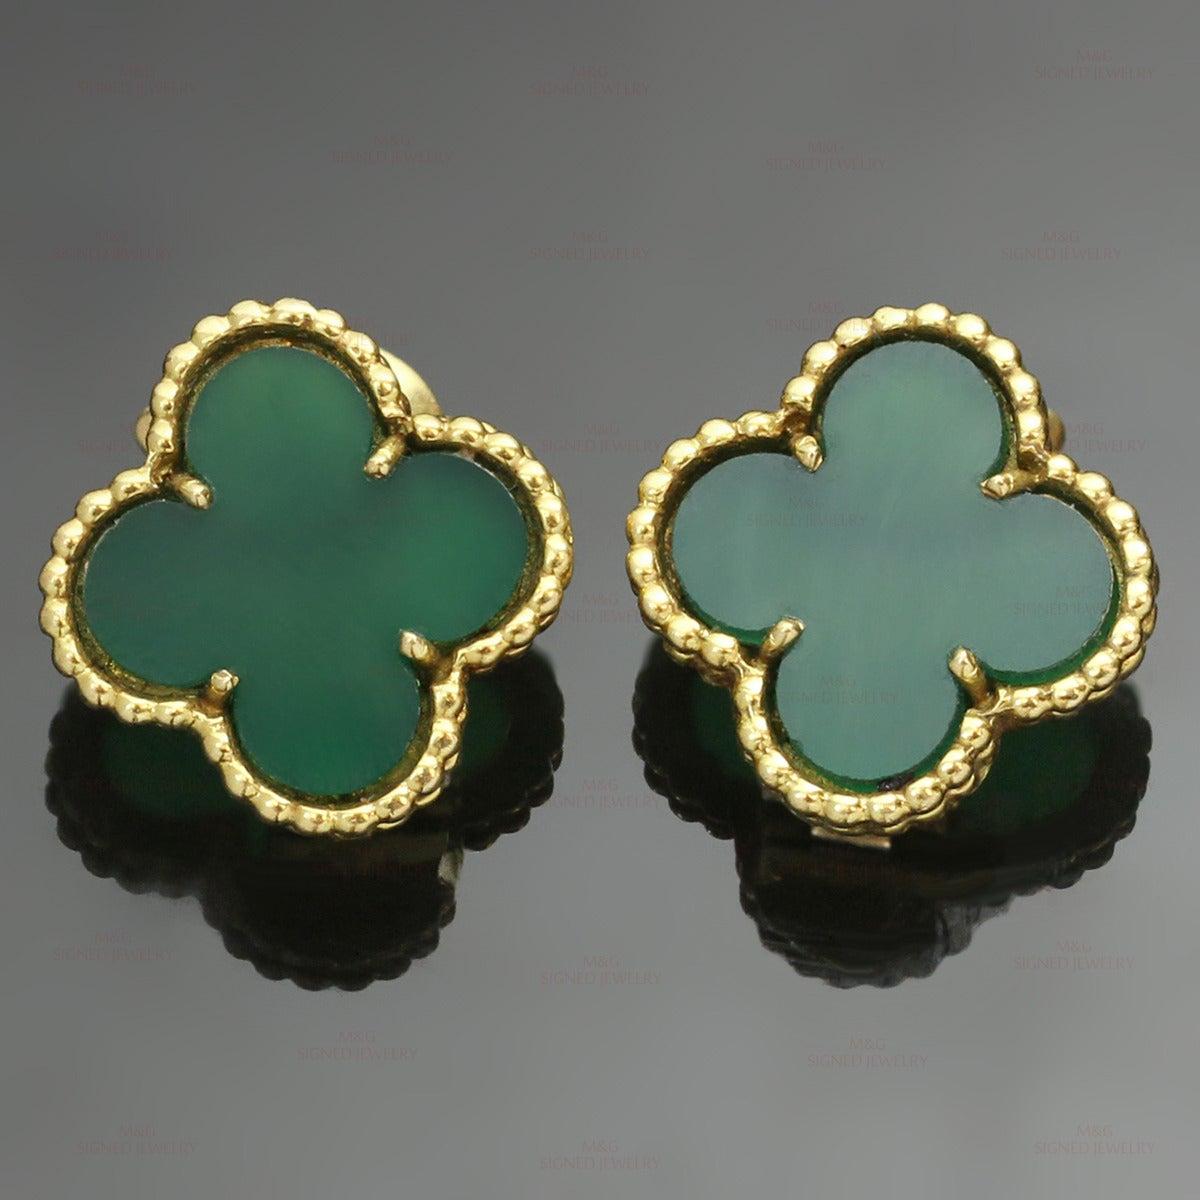 1970s Van Cleef & Arpels Alhambra Green Chalcedony Gold Earrings For Sale 2